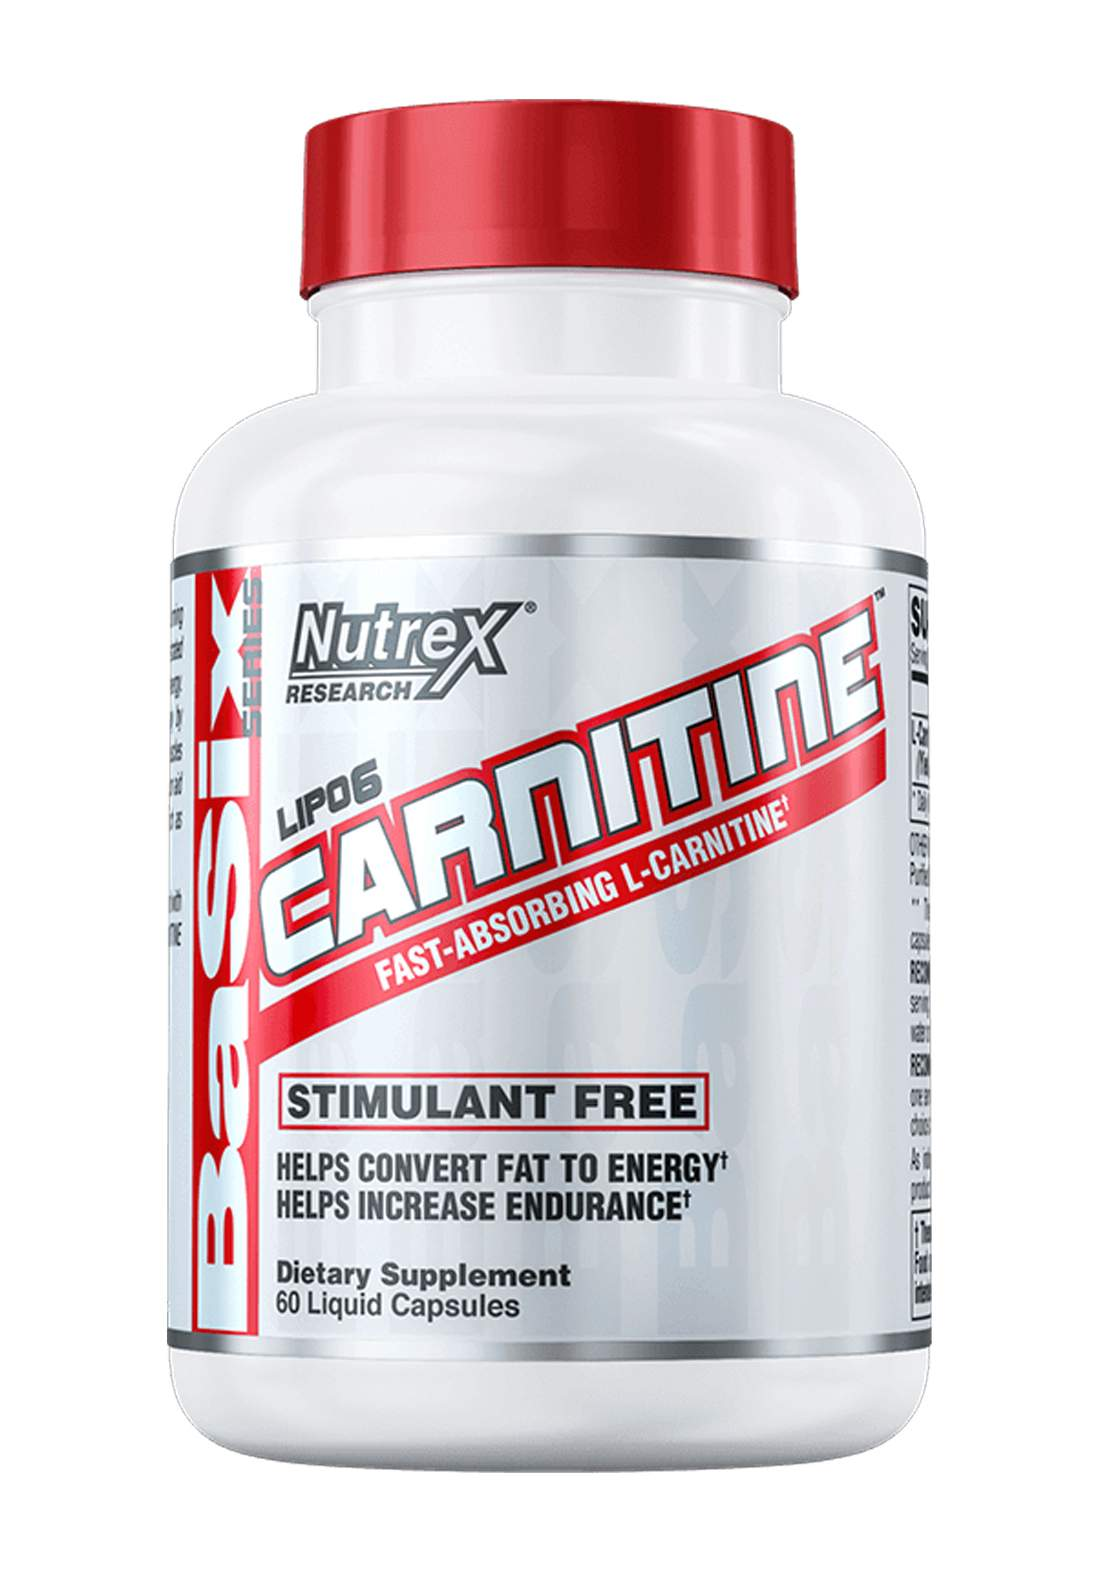 Nutrex Lipo 6  Carnitine Fast Absorbing  60 Liquid Caps   مكمل غذائي لانقاص الوزن